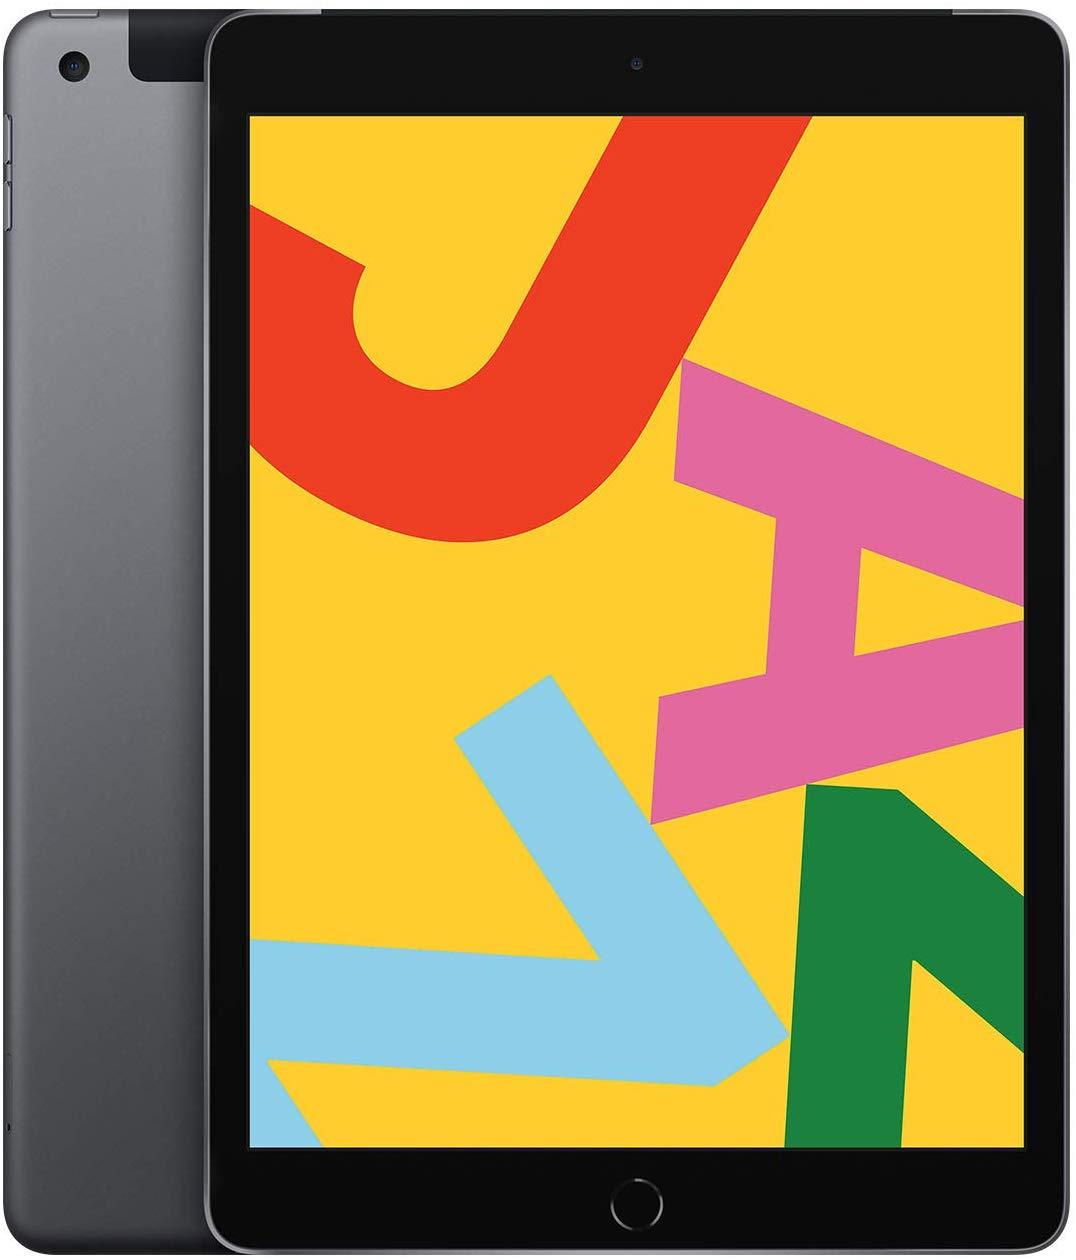 "Tablette 10.2"" Apple iPad (2019) - 128 Go, Wifi, Gris sidéral (Vendeur tiers)"